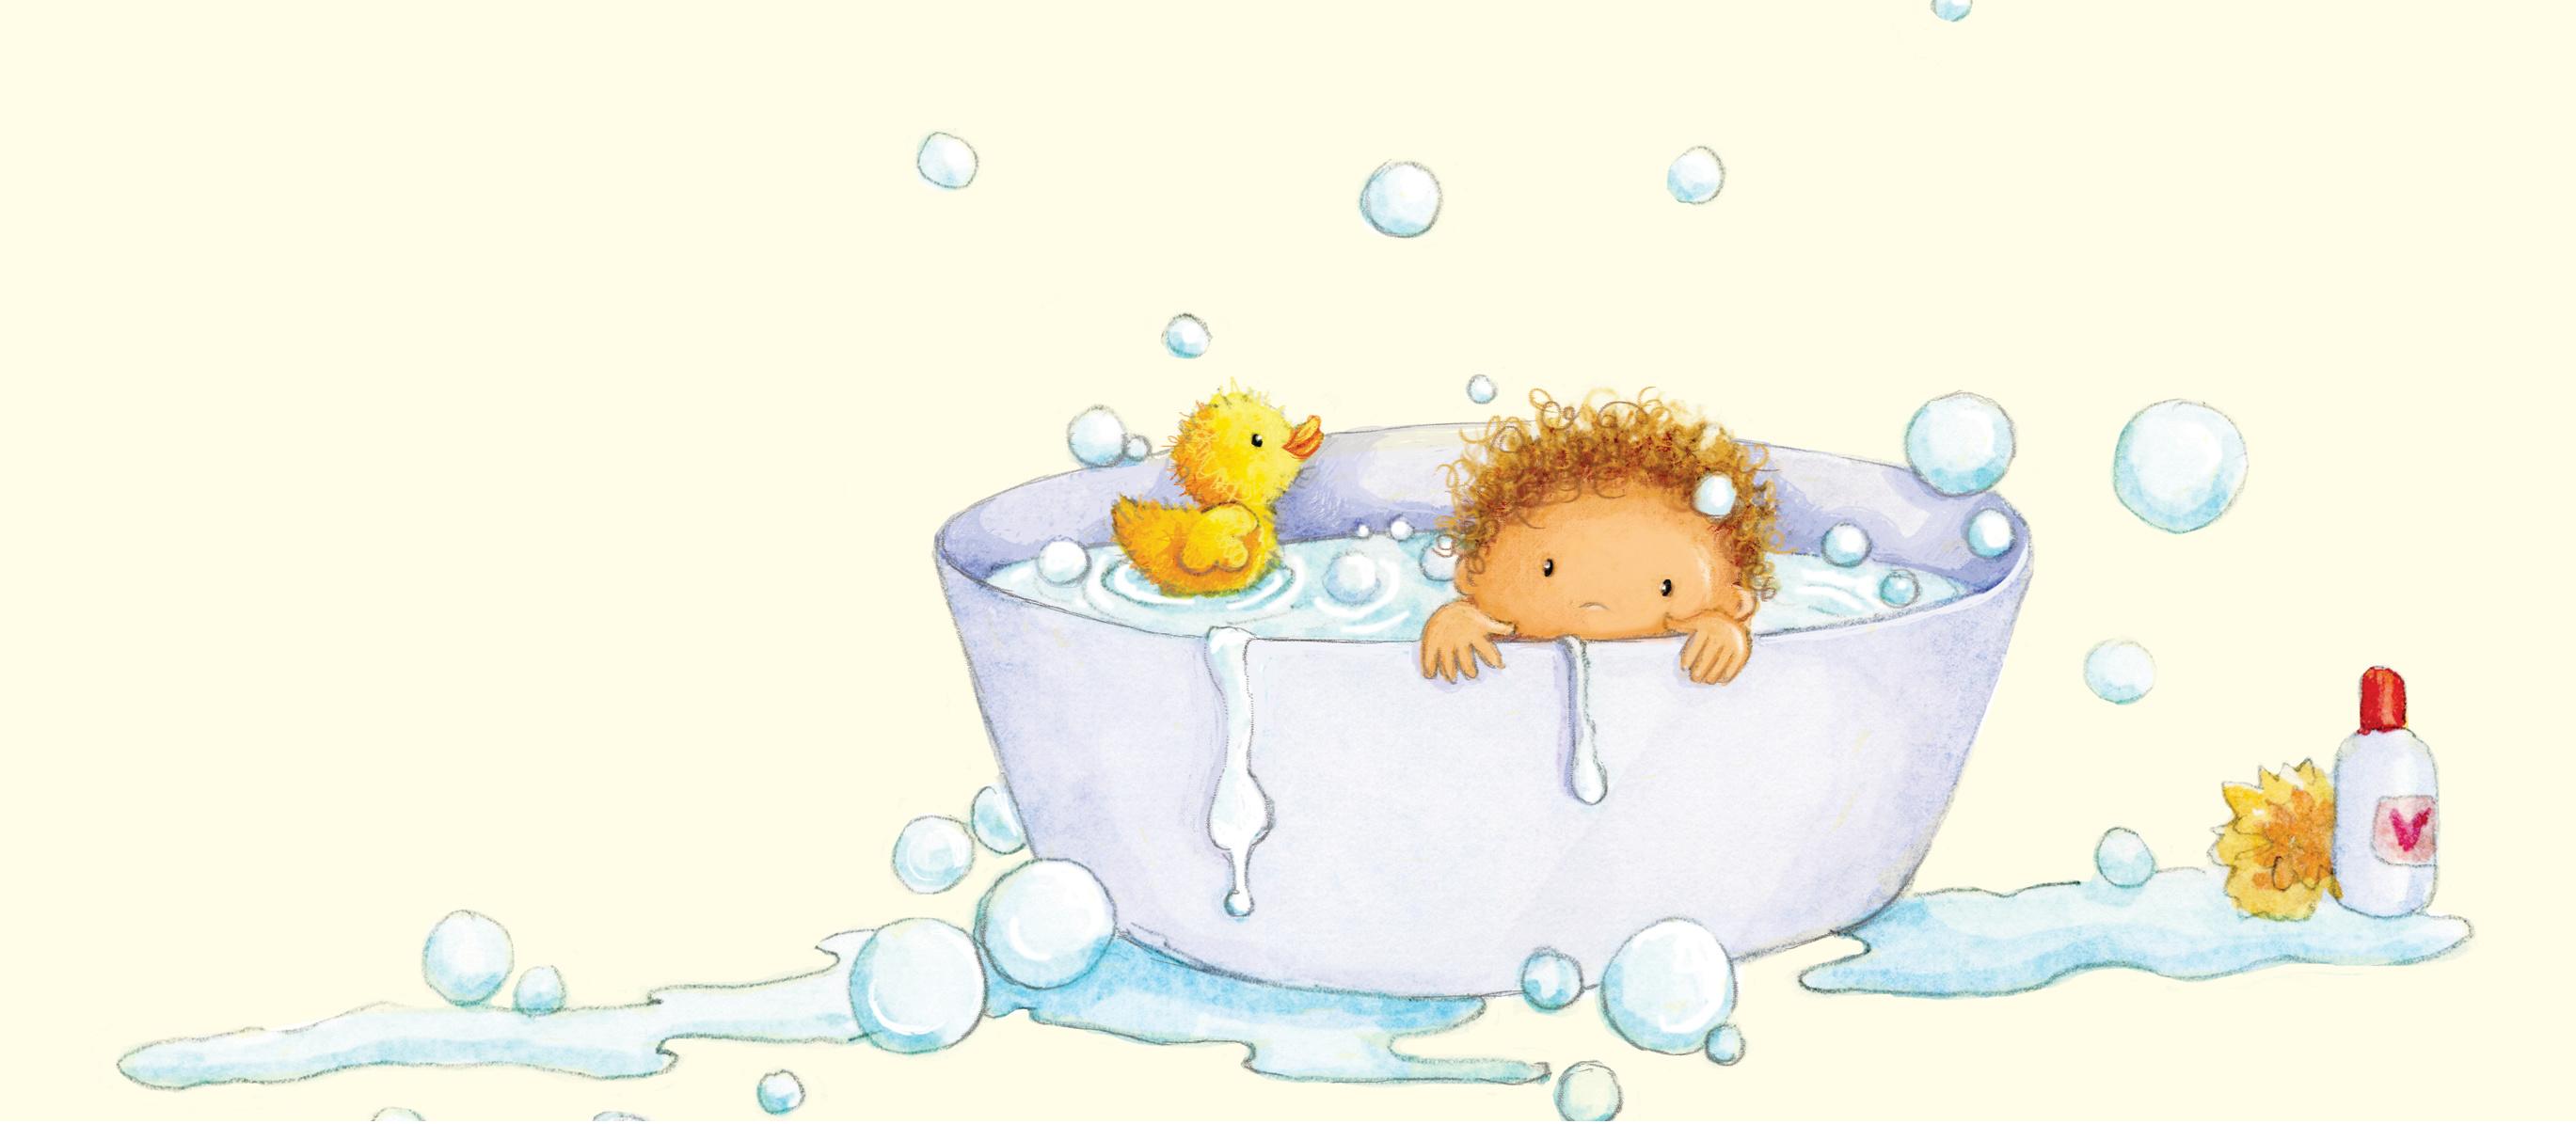 baby in a tin bath_illustration_gail yerrill